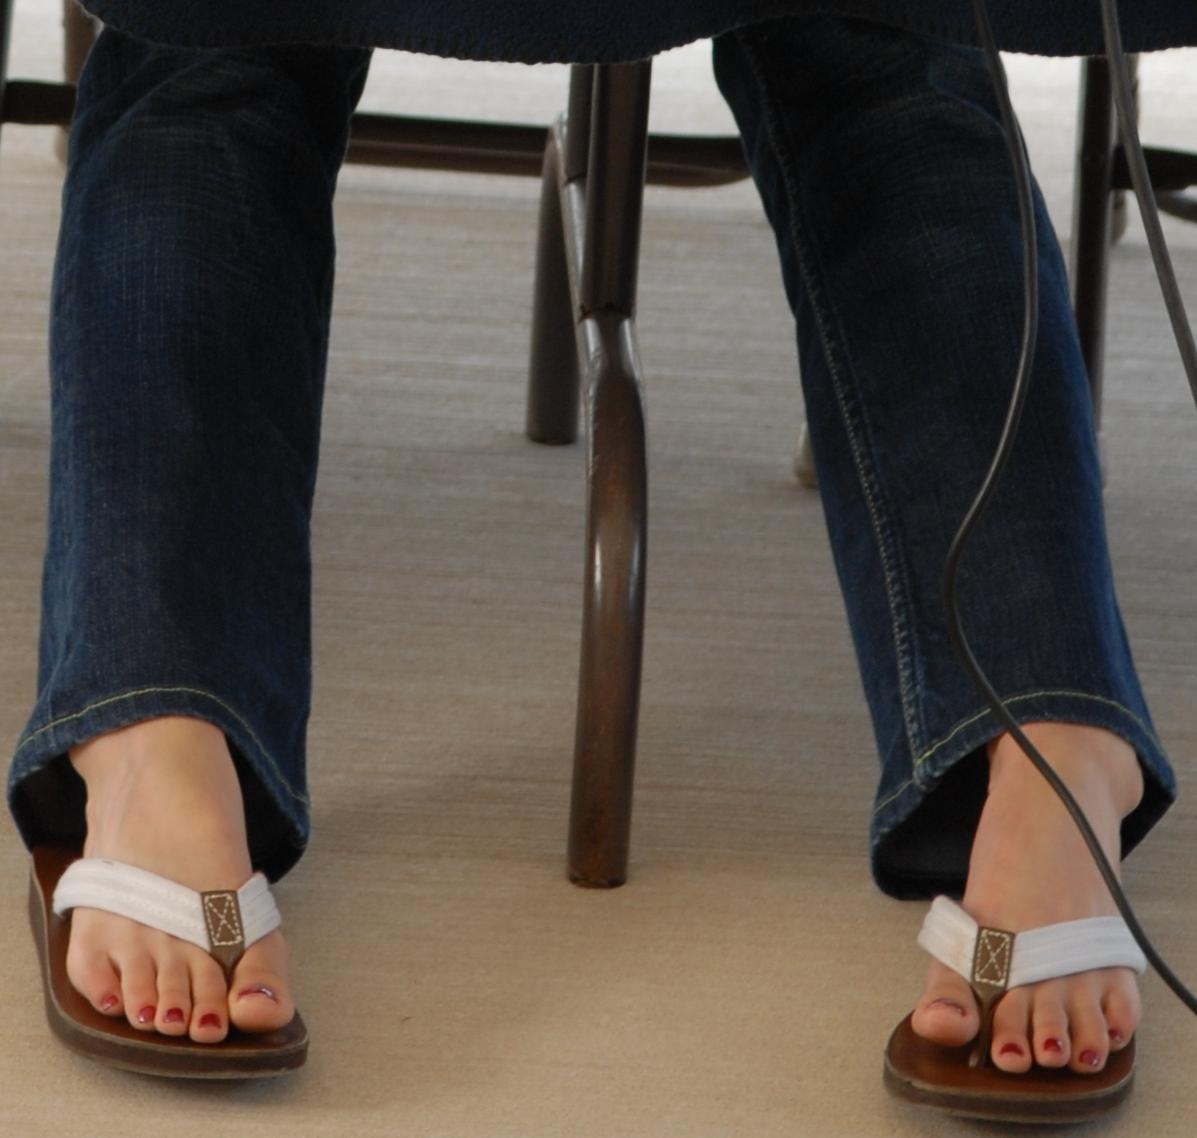 http://1.bp.blogspot.com/_UaLWp72nij4/S60R1tK_EgI/AAAAAAAAFYM/V_pUcFai0FA/s1600/danica-patrick-feet-3.jpg